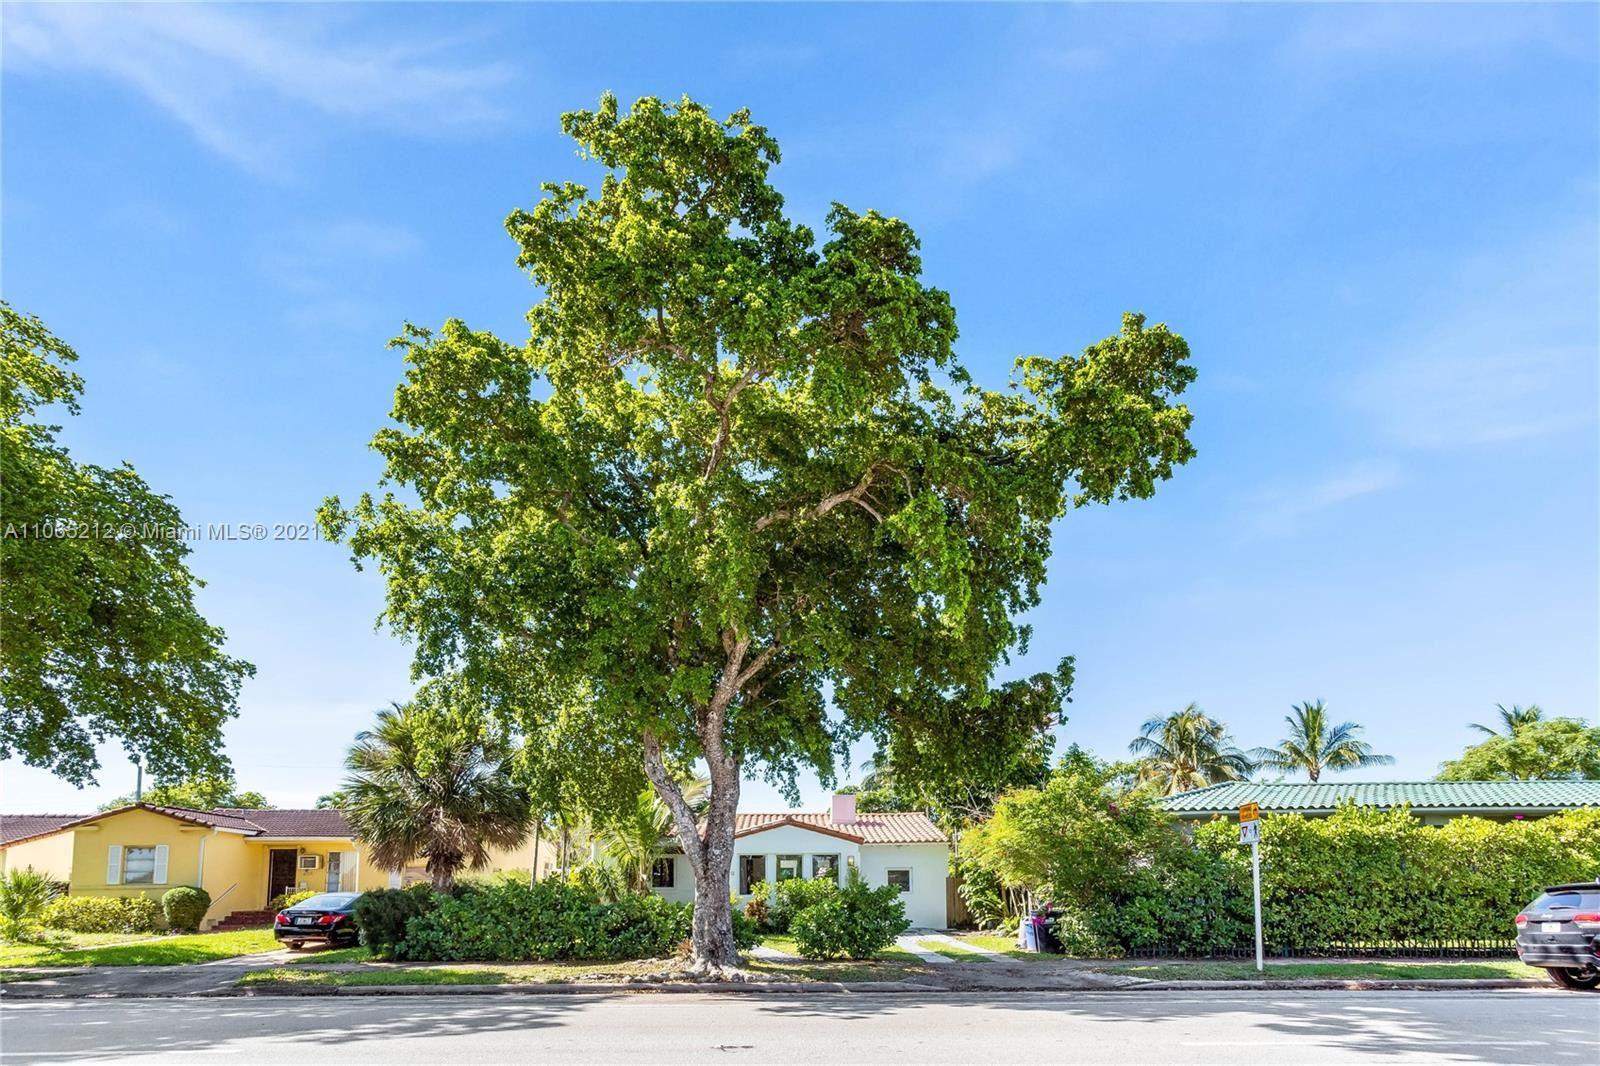 Photo of 1590 Normandy Dr, Miami Beach, FL 33141 (MLS # A11065212)